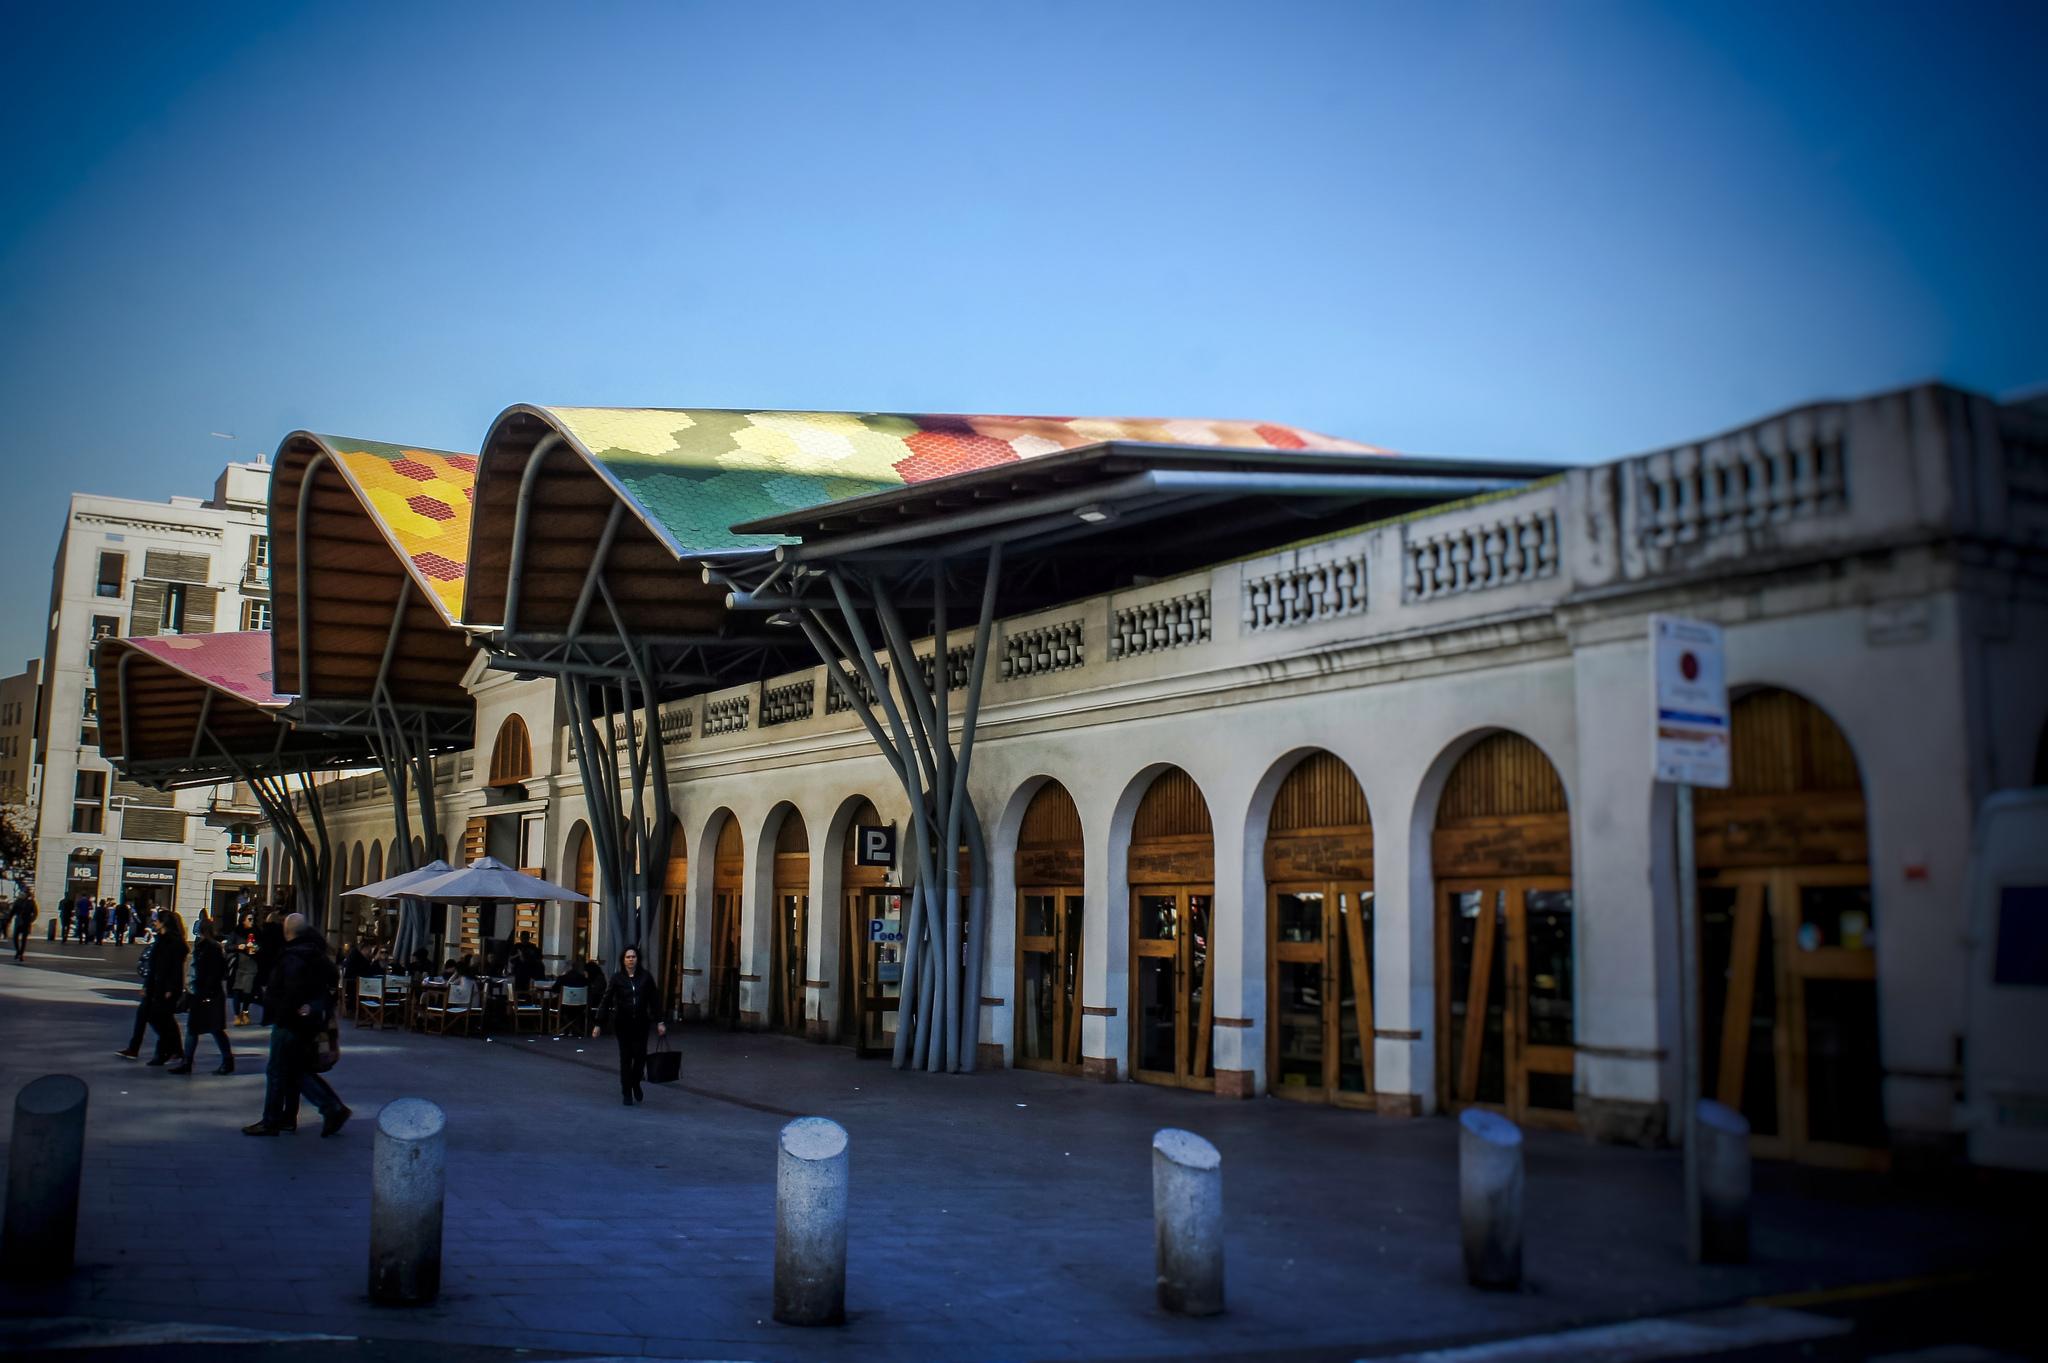 The Santa Caterina market © W & J